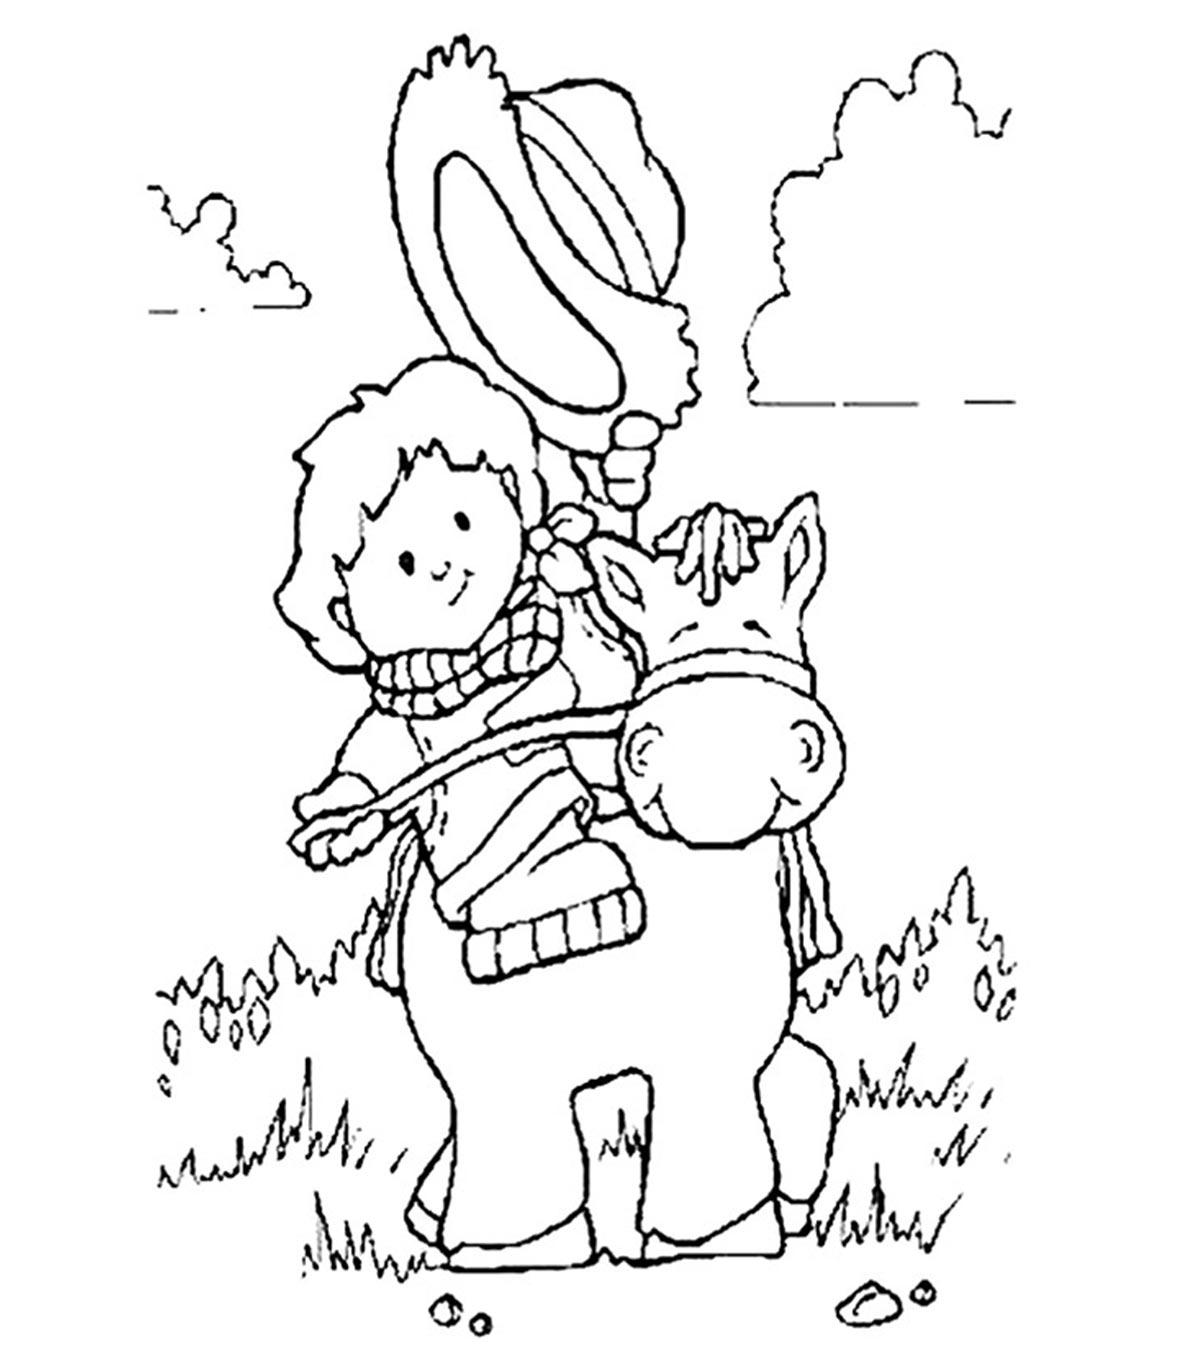 Best Coloring Pages Site: Simple Cowboy Coloring Pages ...